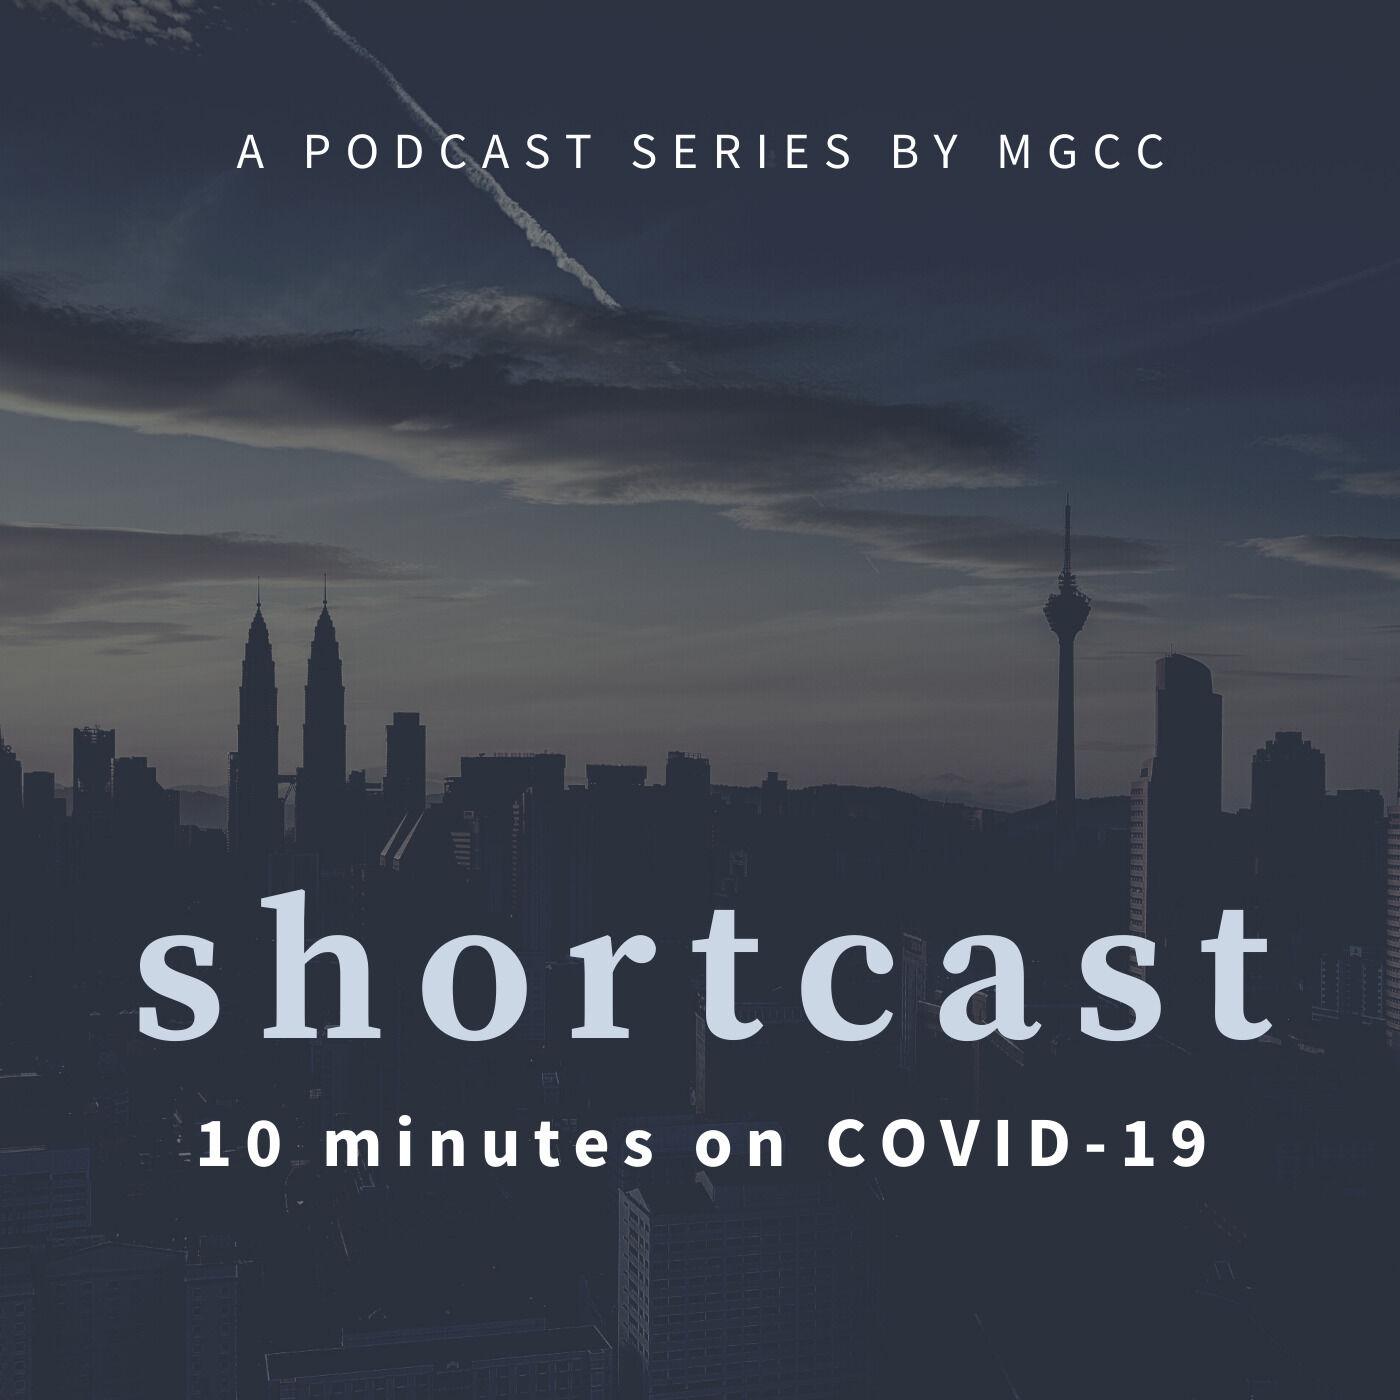 Shortcast #003: Tsu-Shien Teoh (Henkel) & Miriam Shastri (Top Beraten)